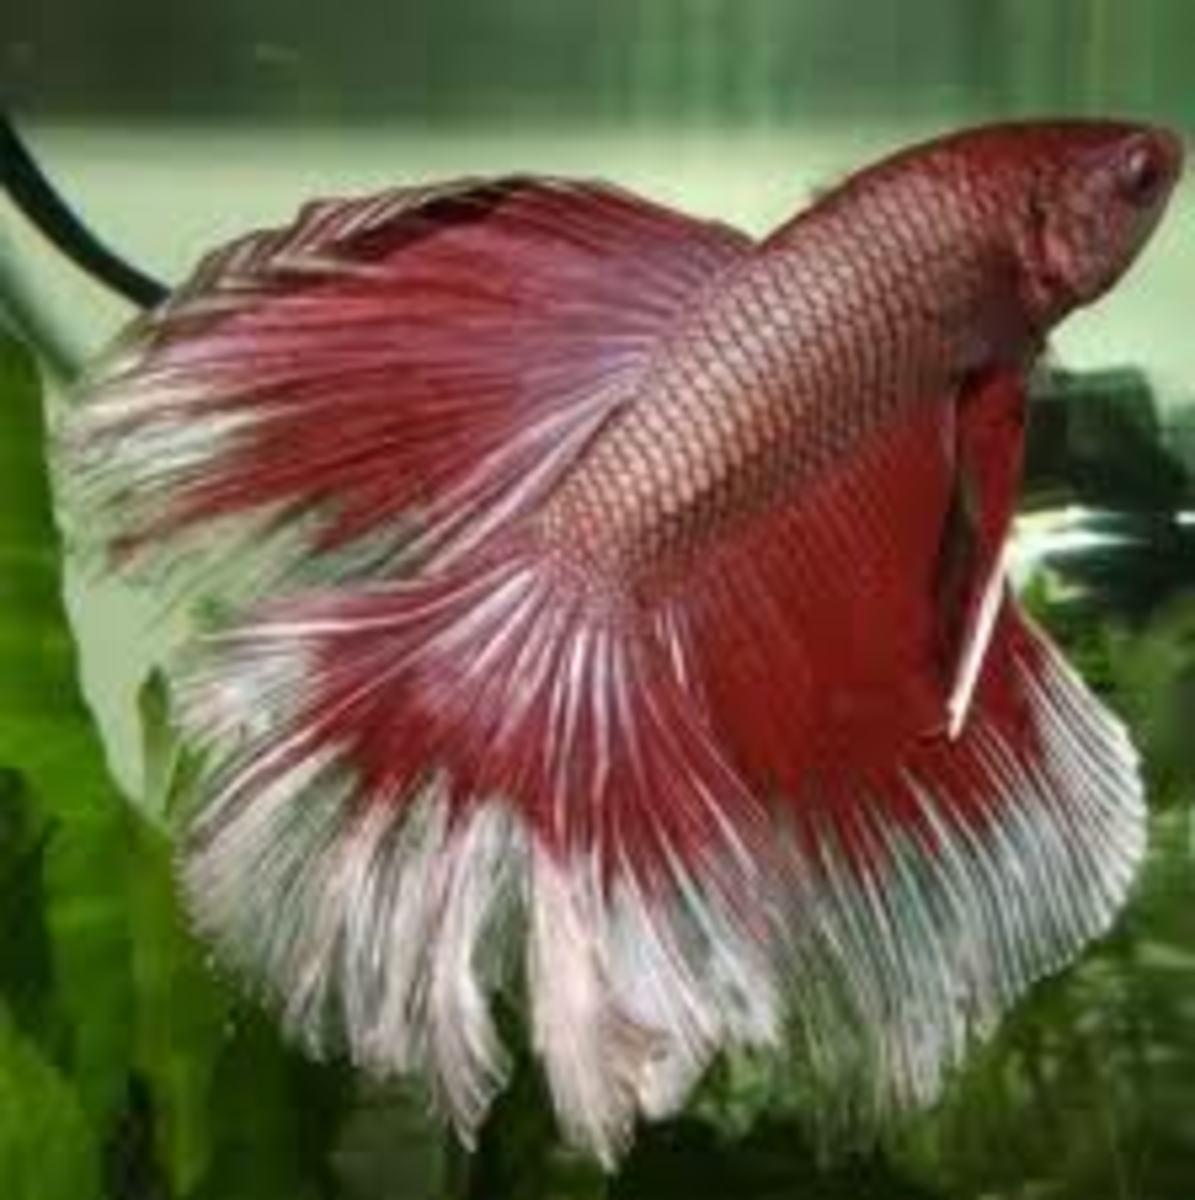 Male Betta Fish (Image)